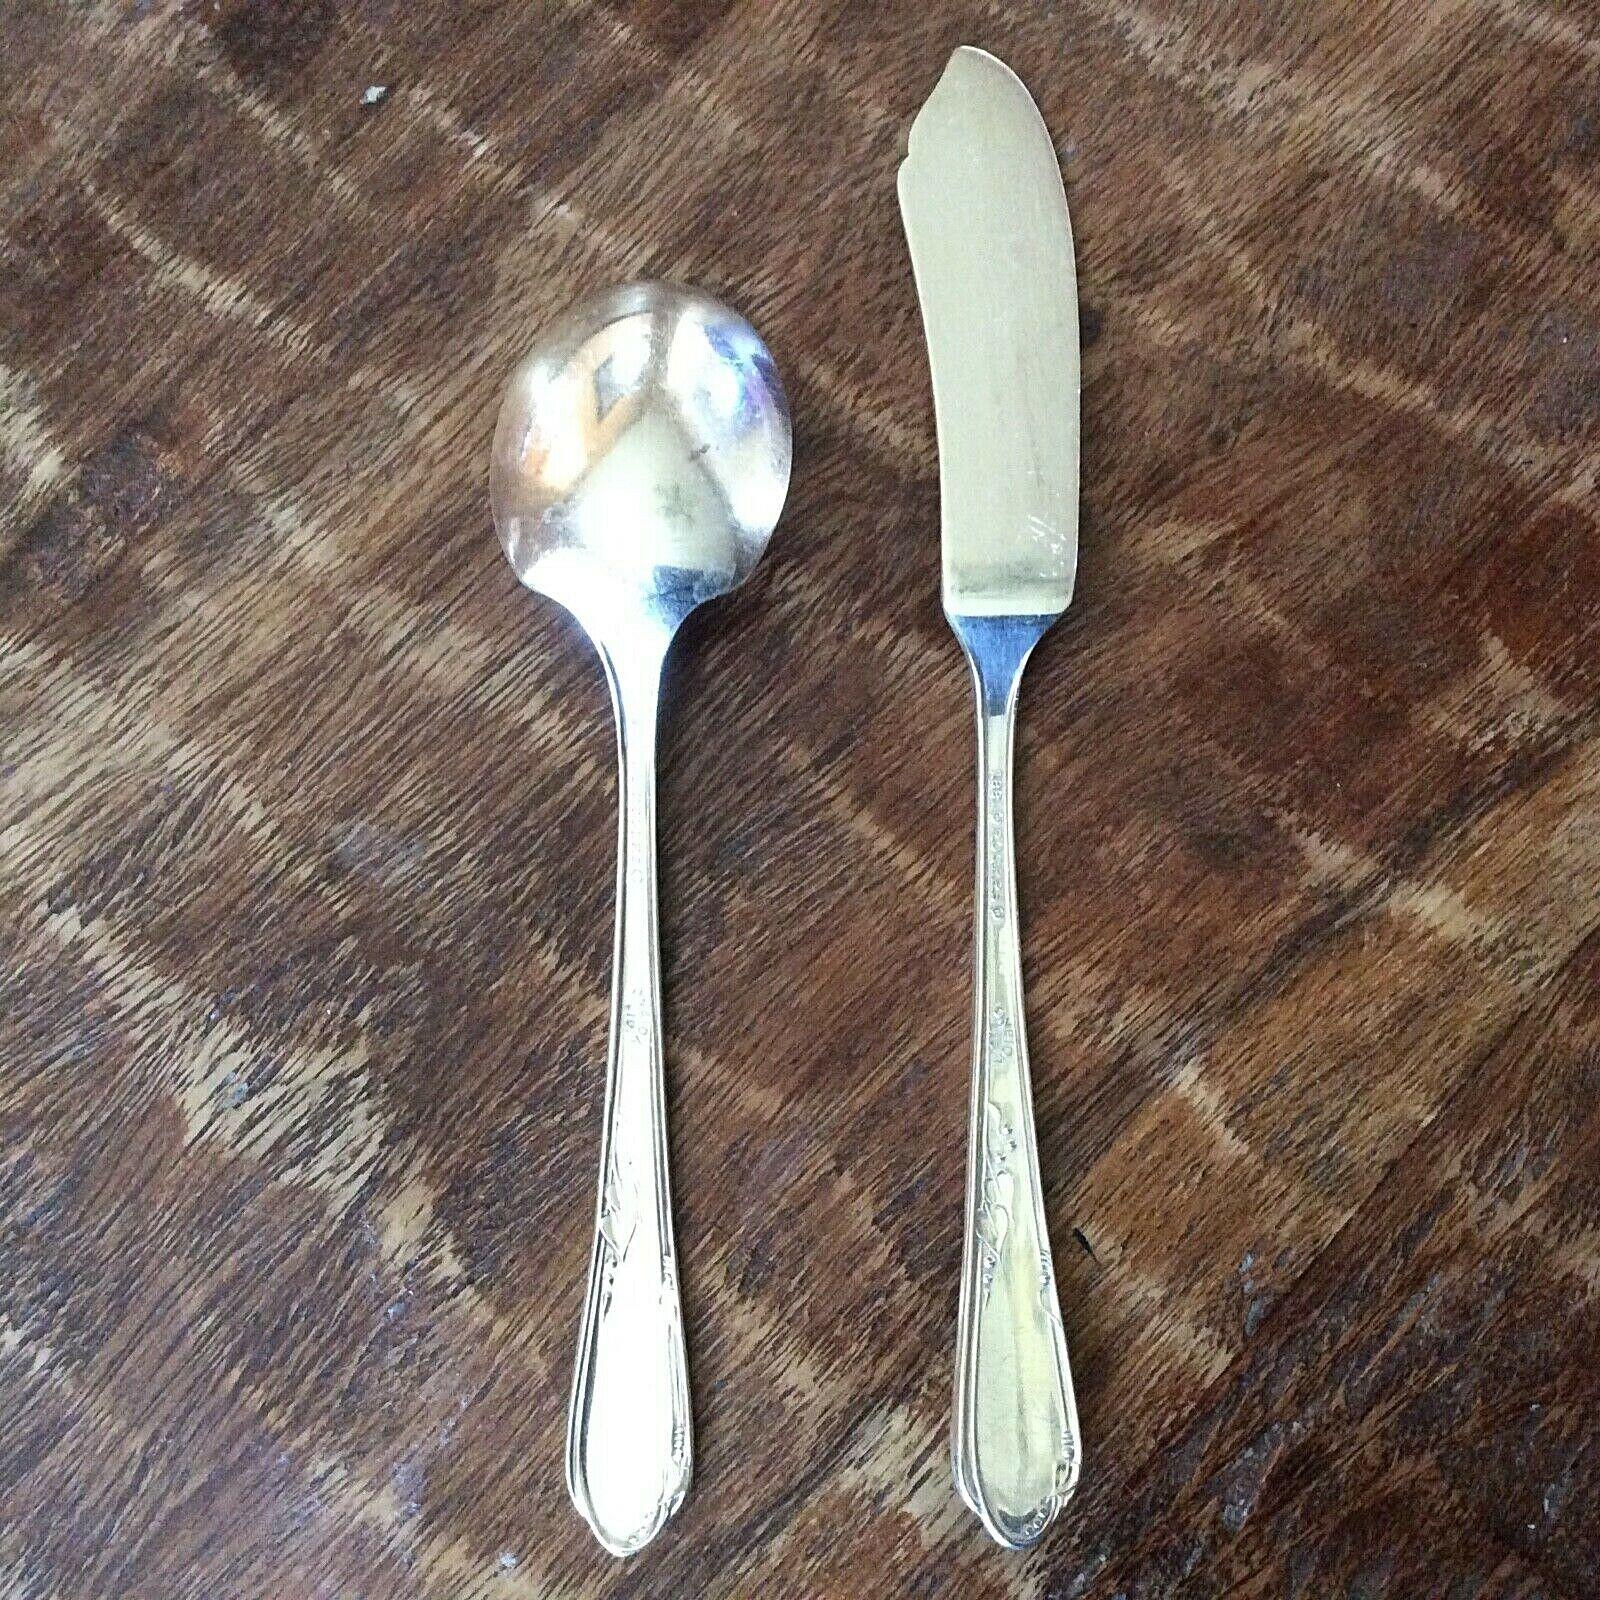 1881 Rogers Oneida Meadowbrook Heather Sugar Spoon Butter Knife Silver Plate Set - $13.49